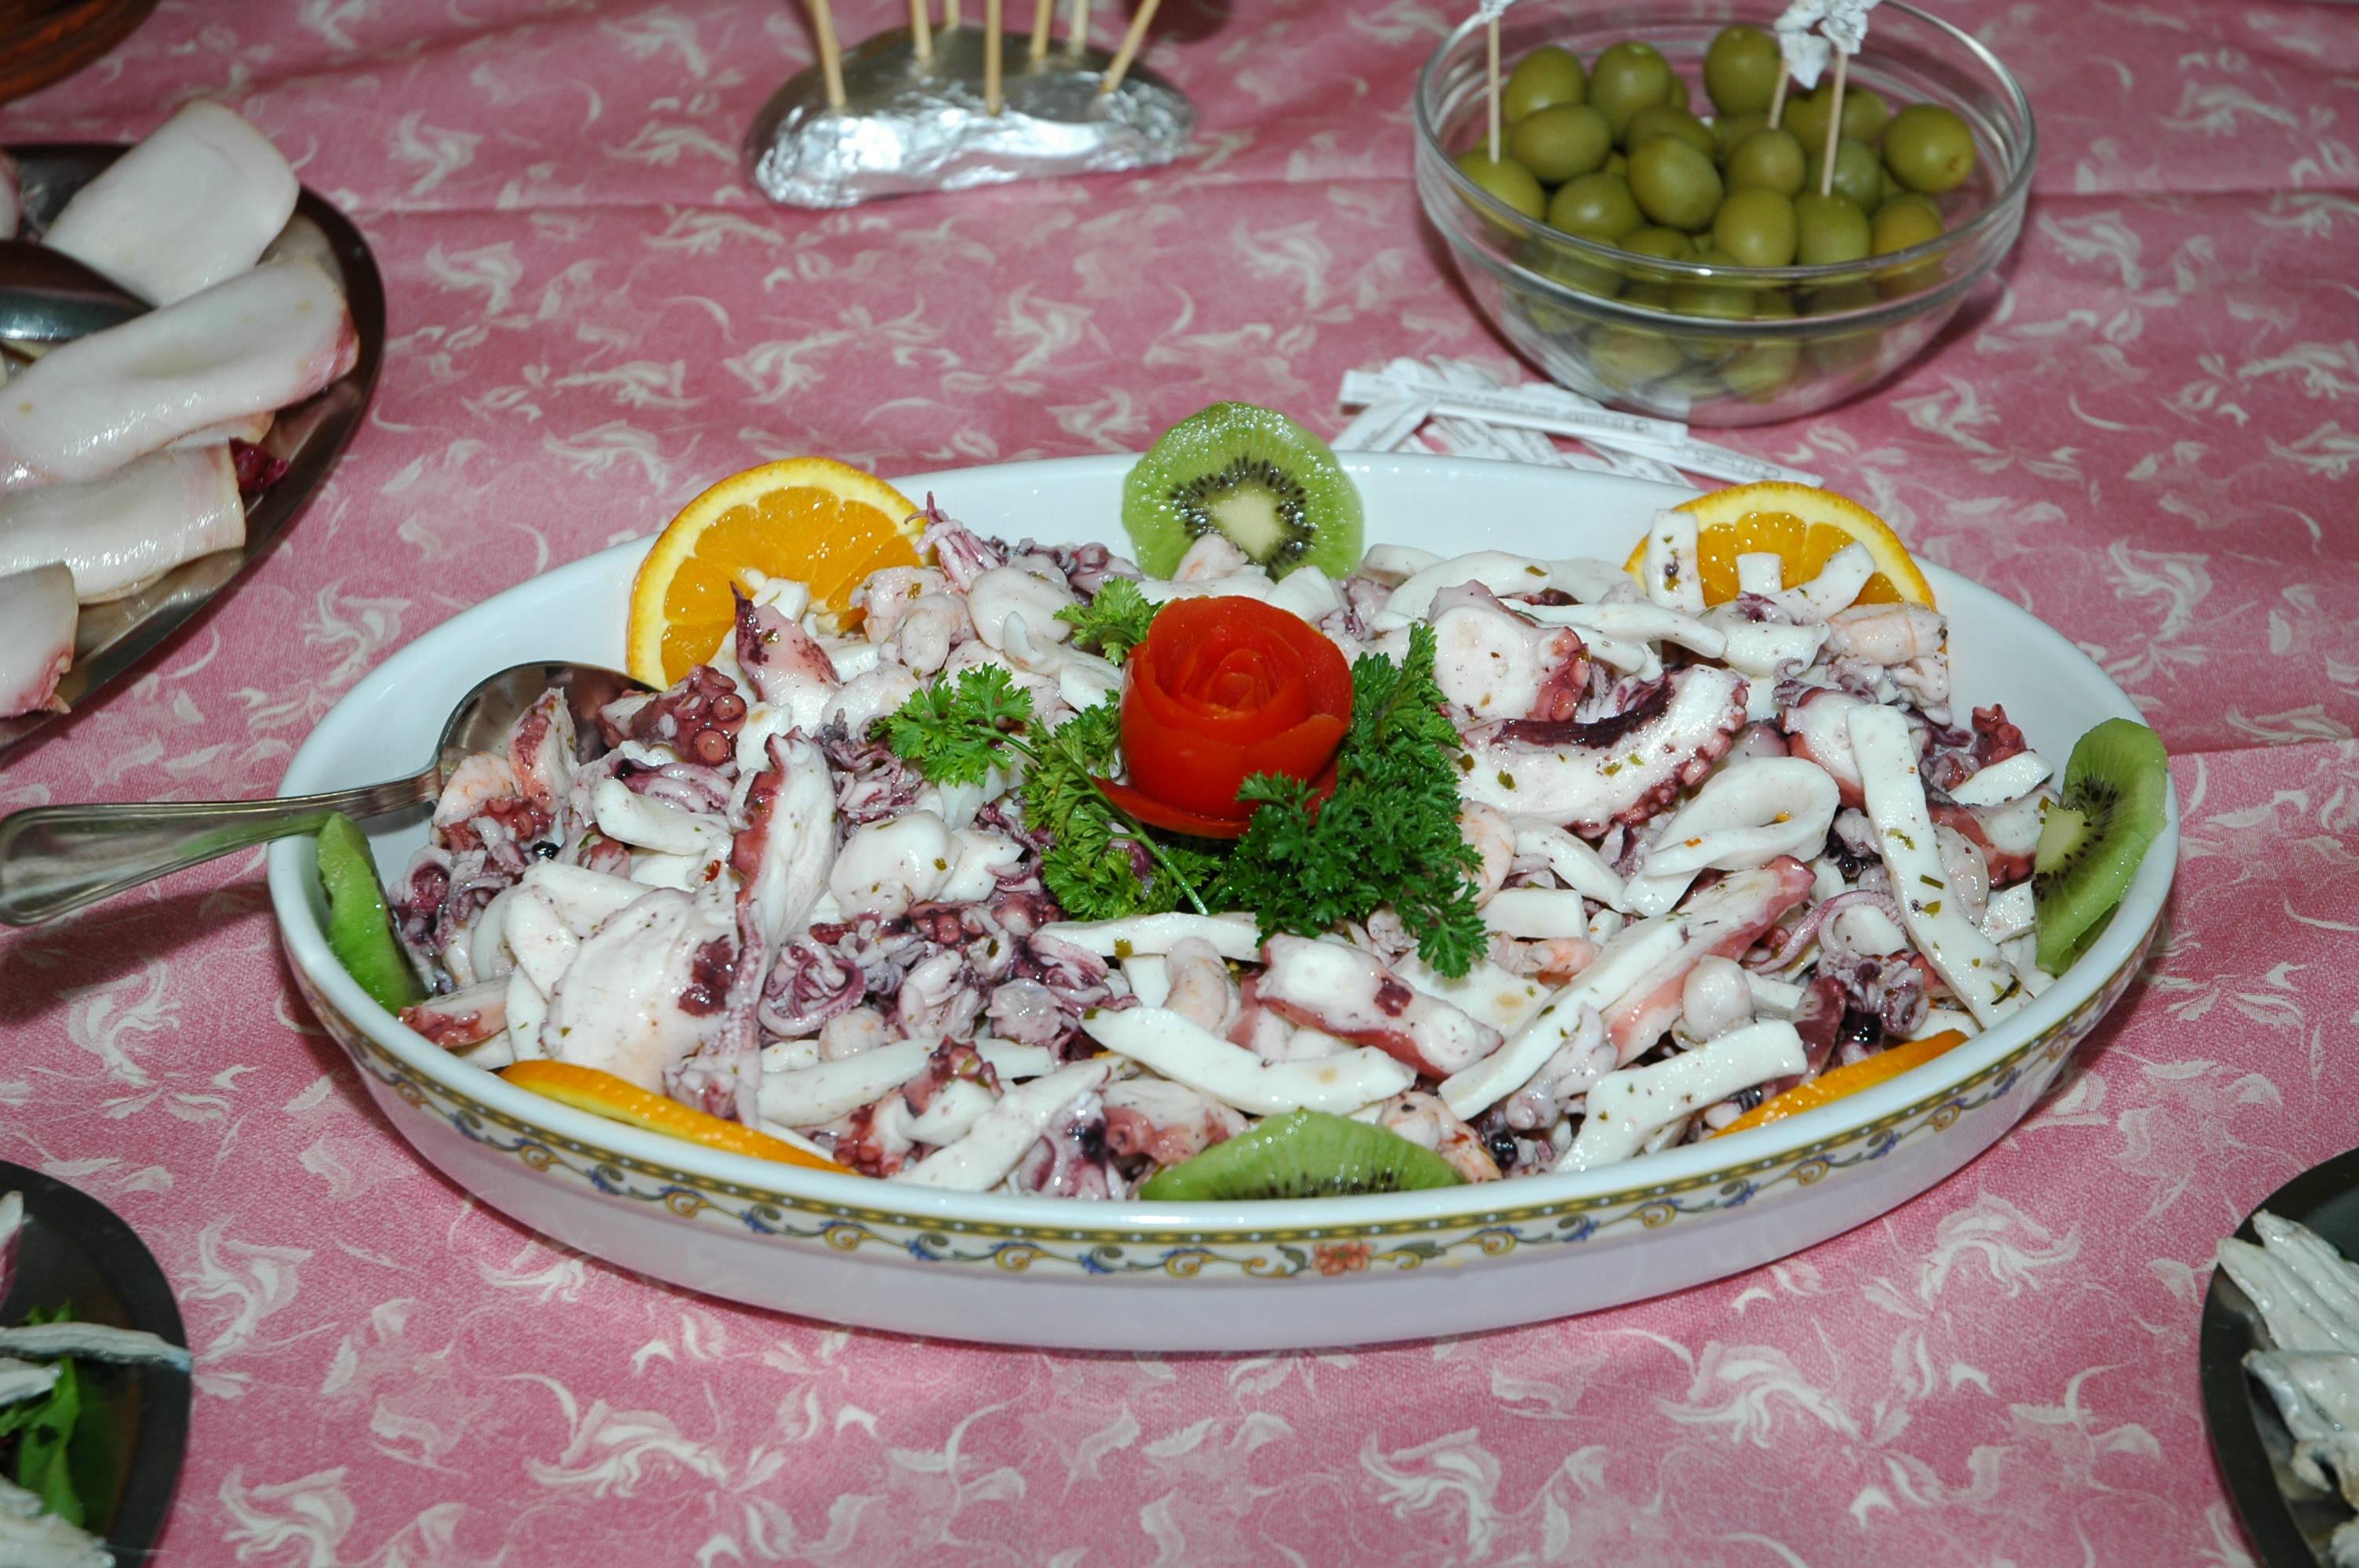 Riccione Hotel Cucina